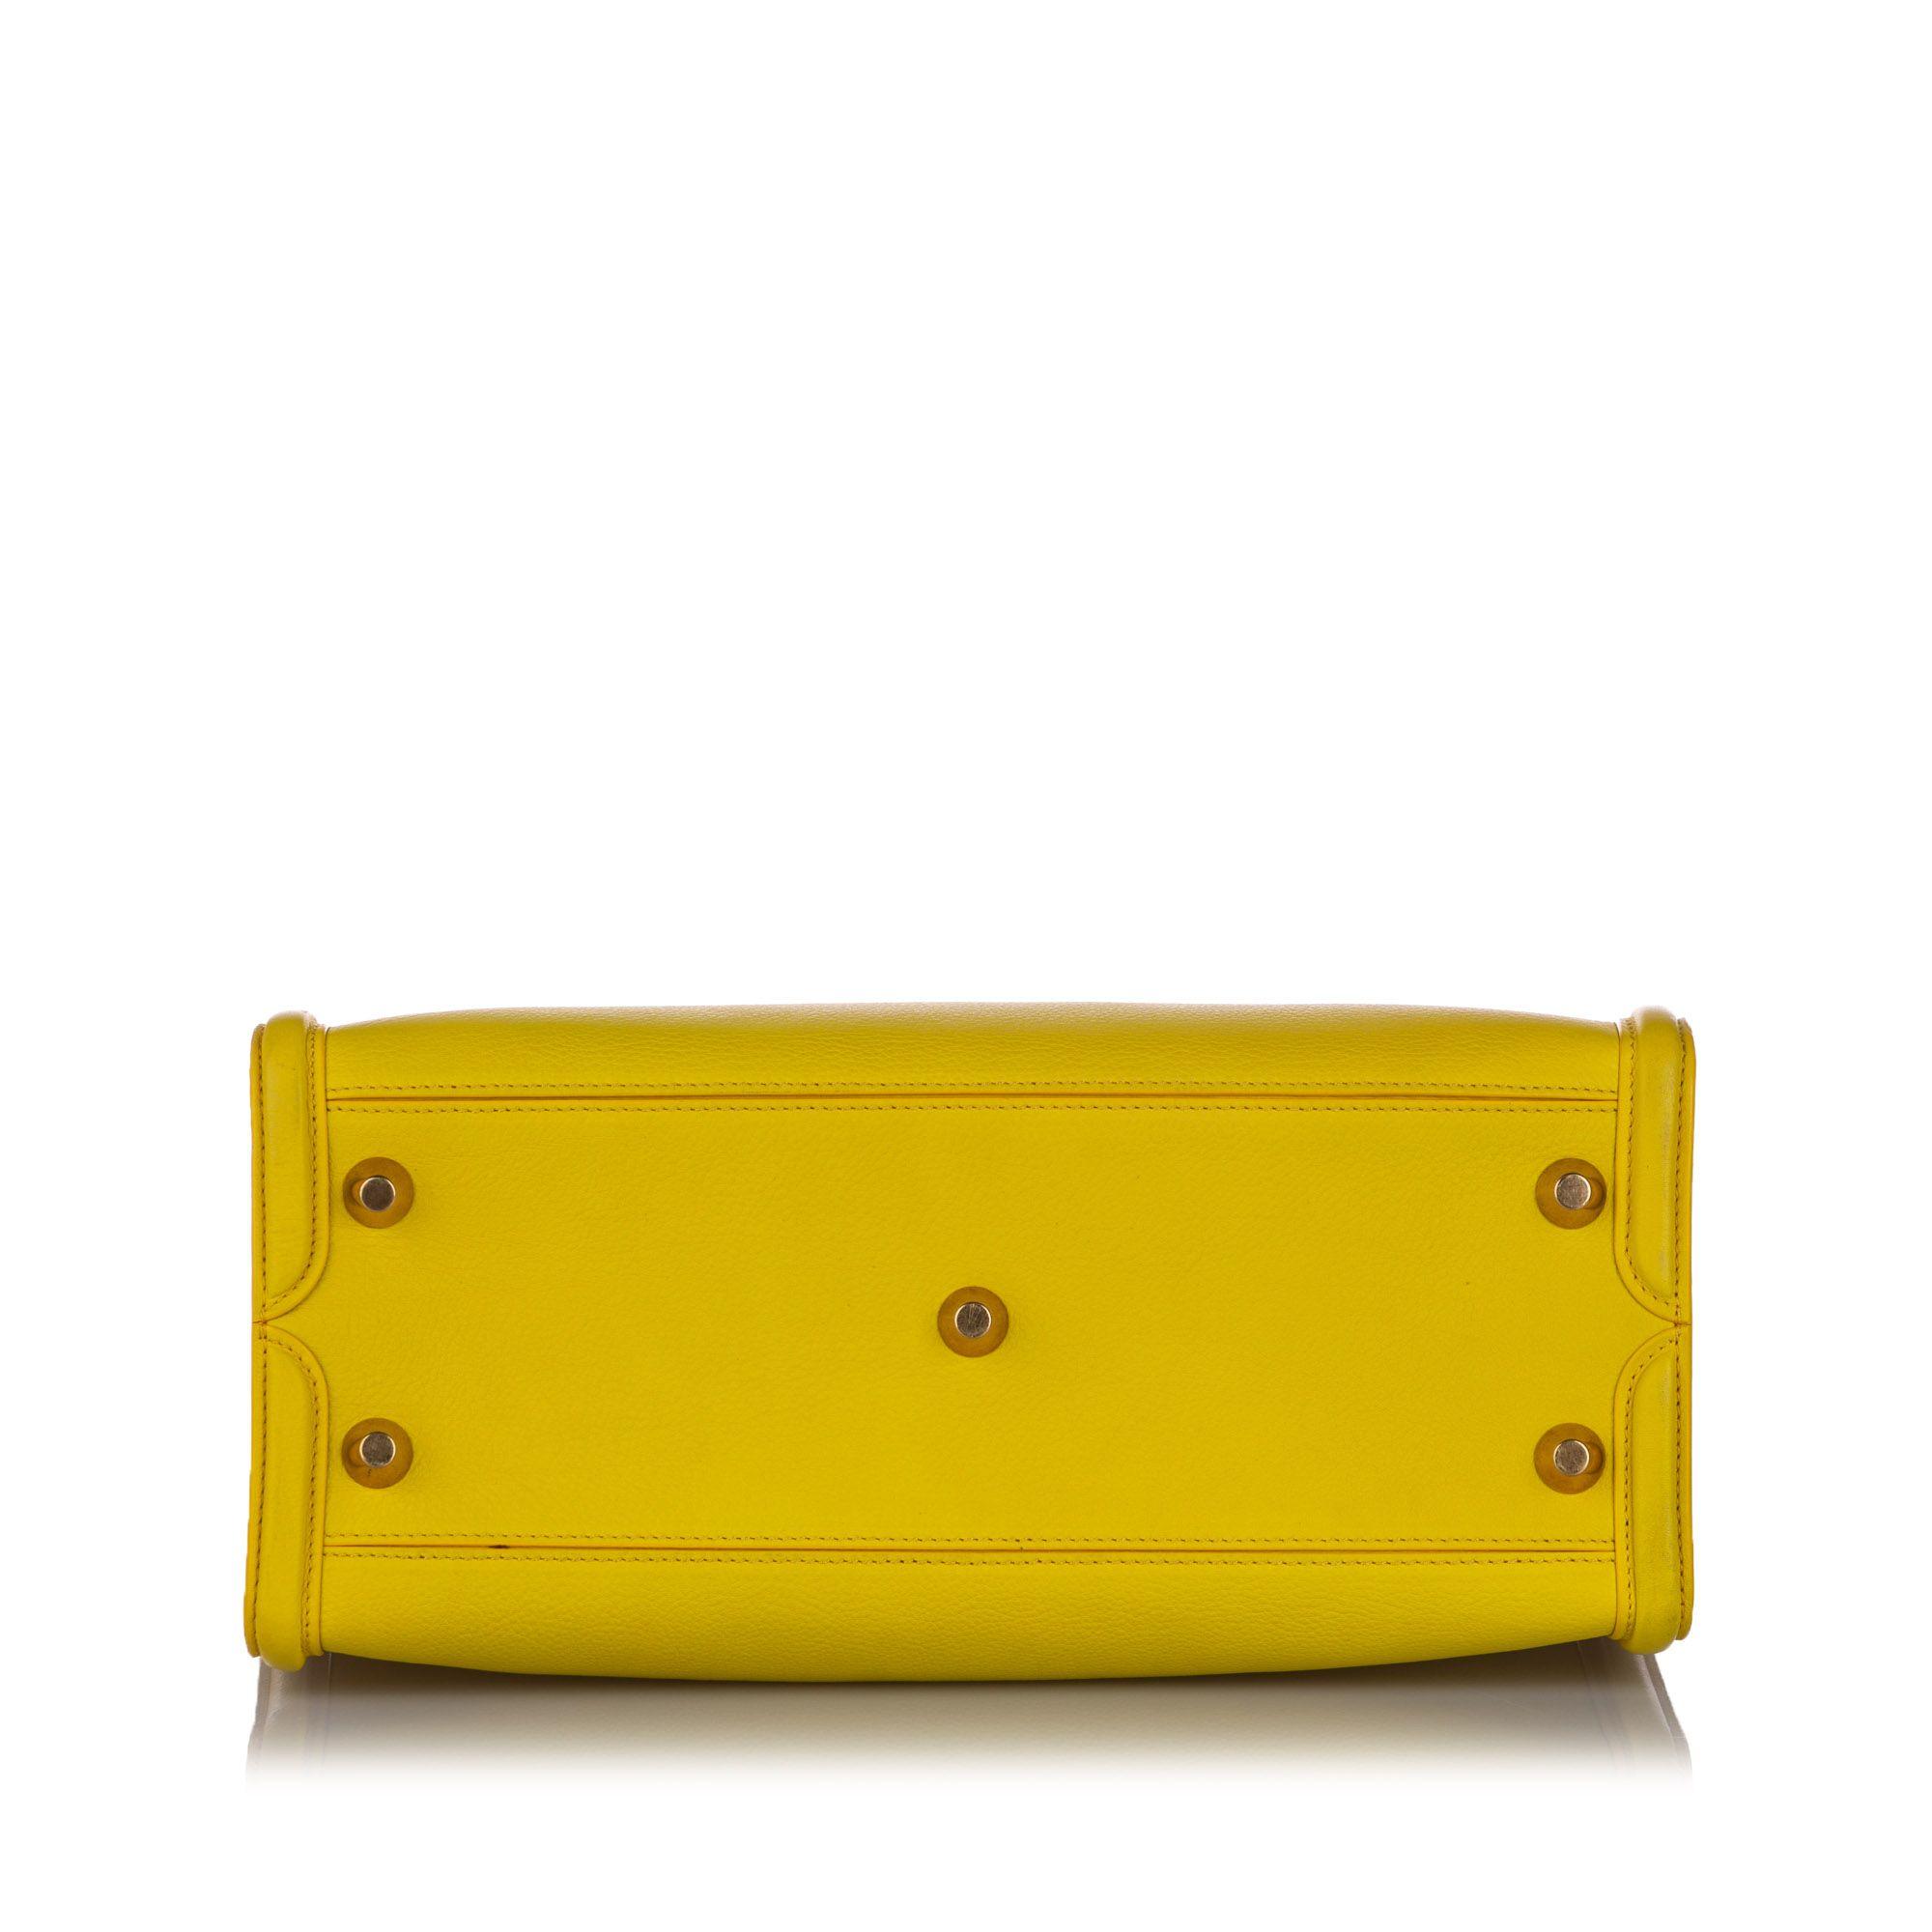 Vintage Alexander McQueen Leather Skull Padlock Tote Yellow